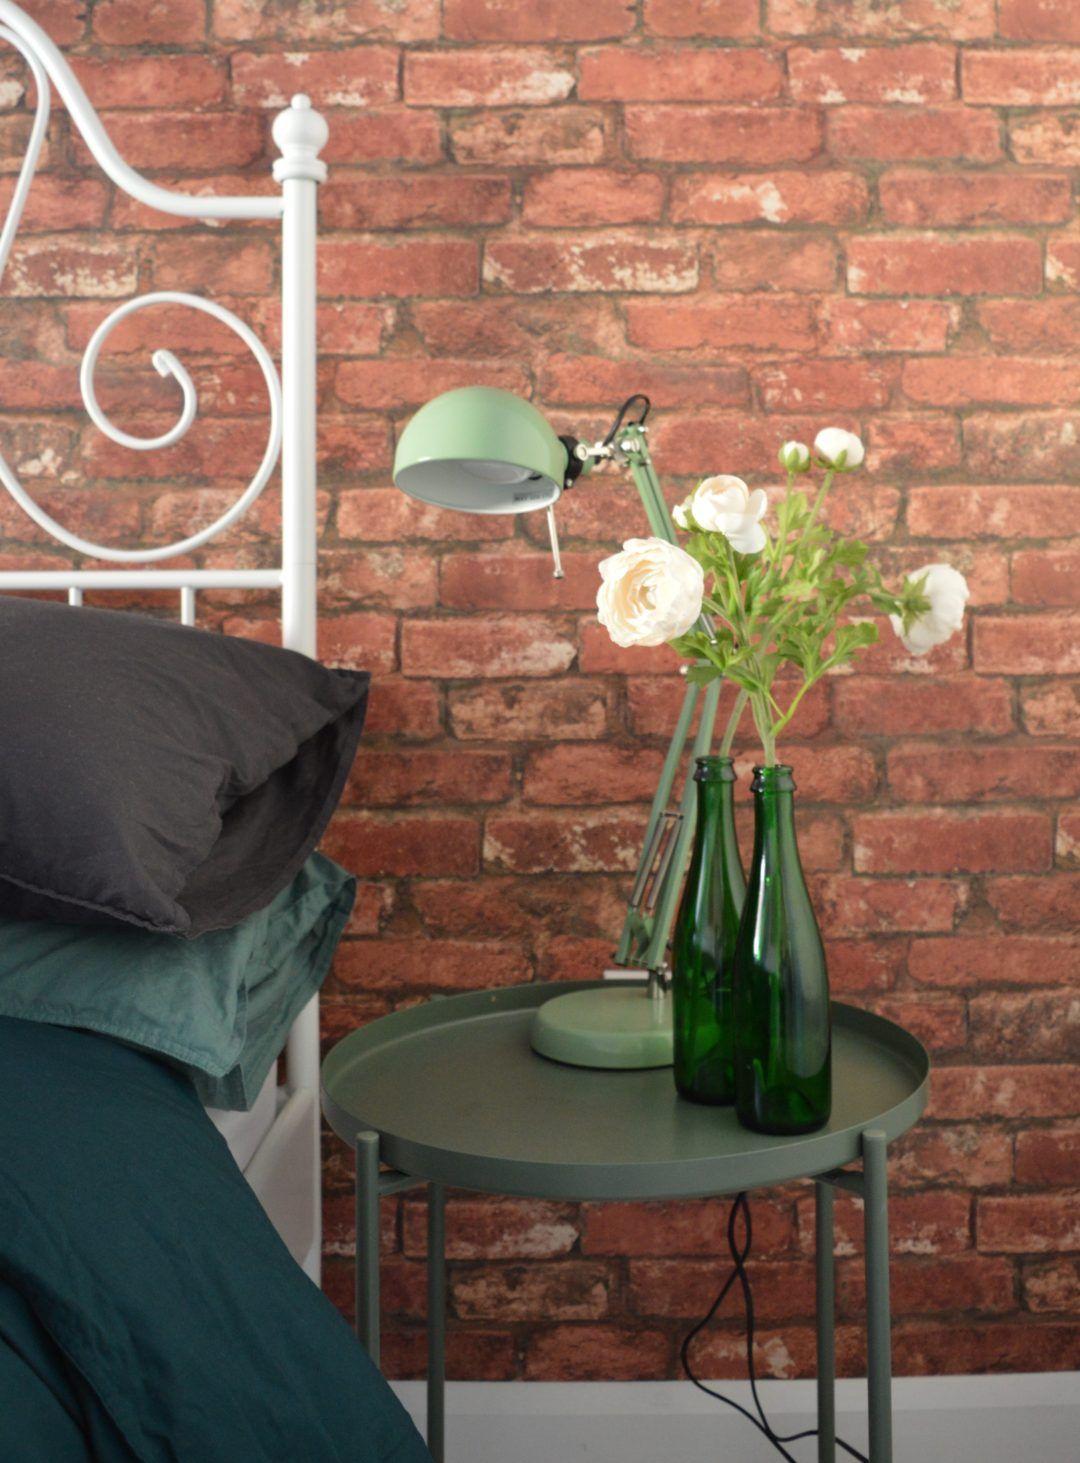 After Master Bedroom Brick Wallpaper Green Flower Ikea Gladom Tray Table Dark Green Forsa Work Lamp Green Ev Dekoru Dekor Evler